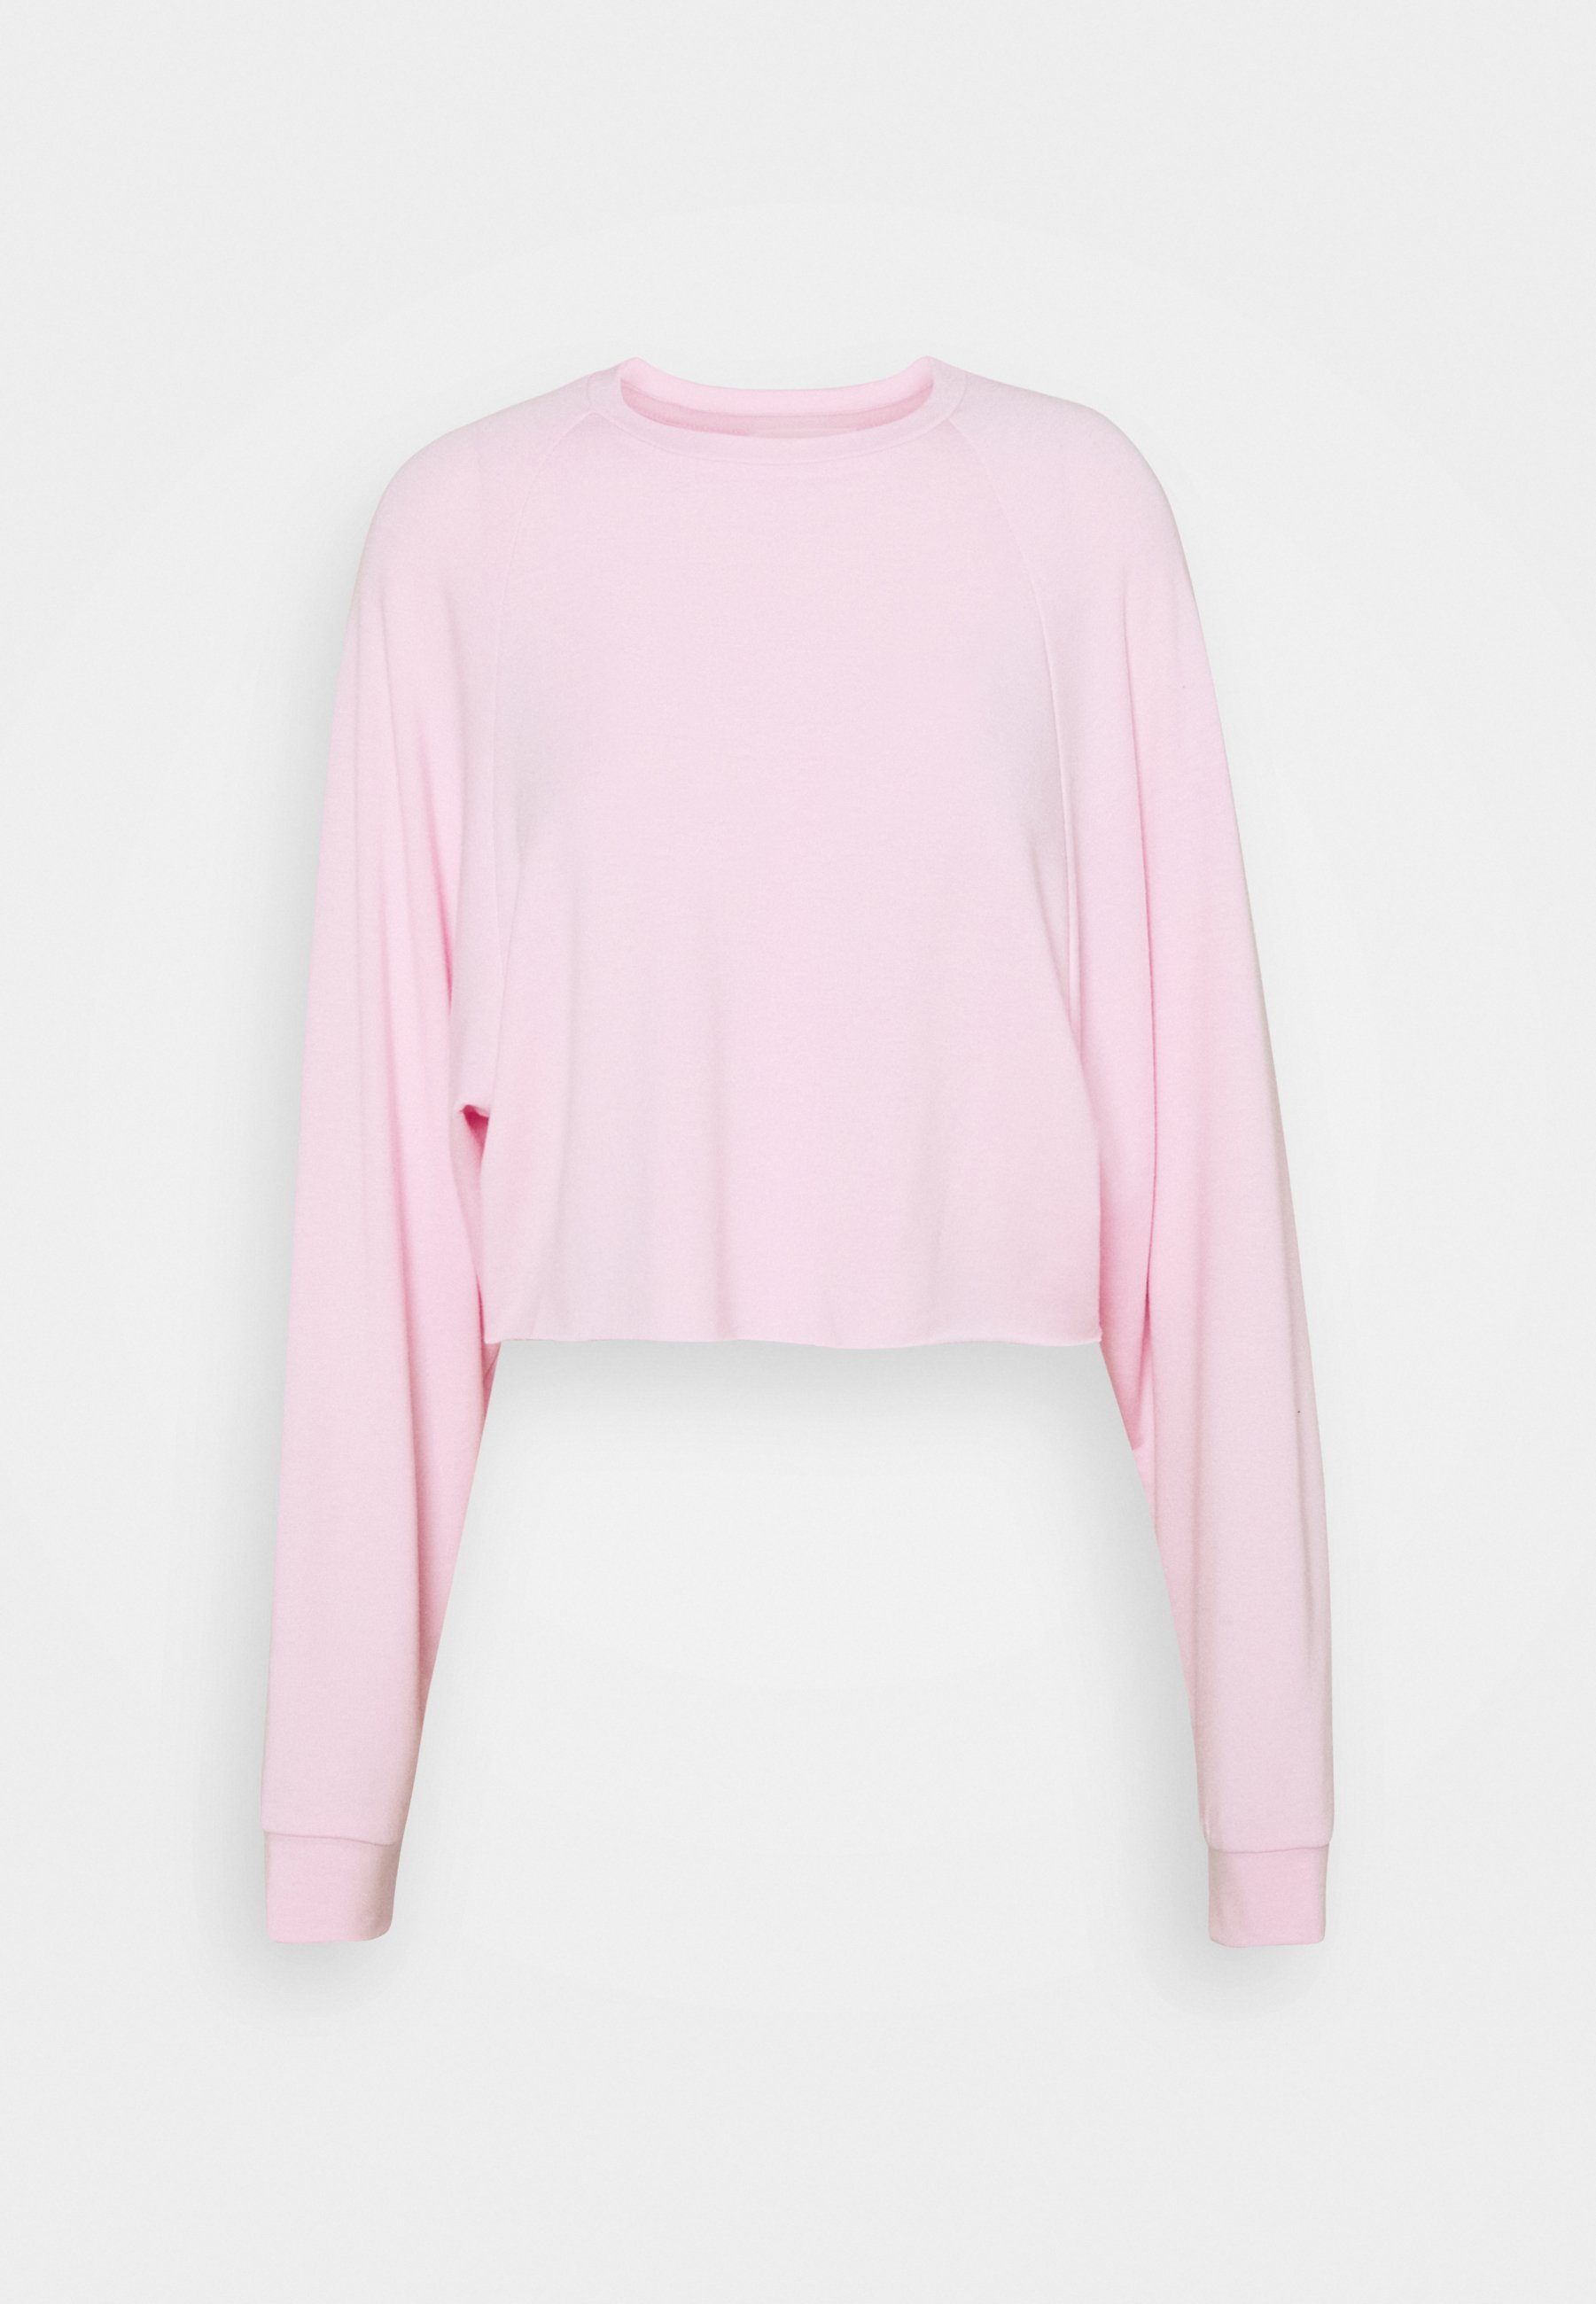 Women BASIC - Raw hem - Sweatshirt